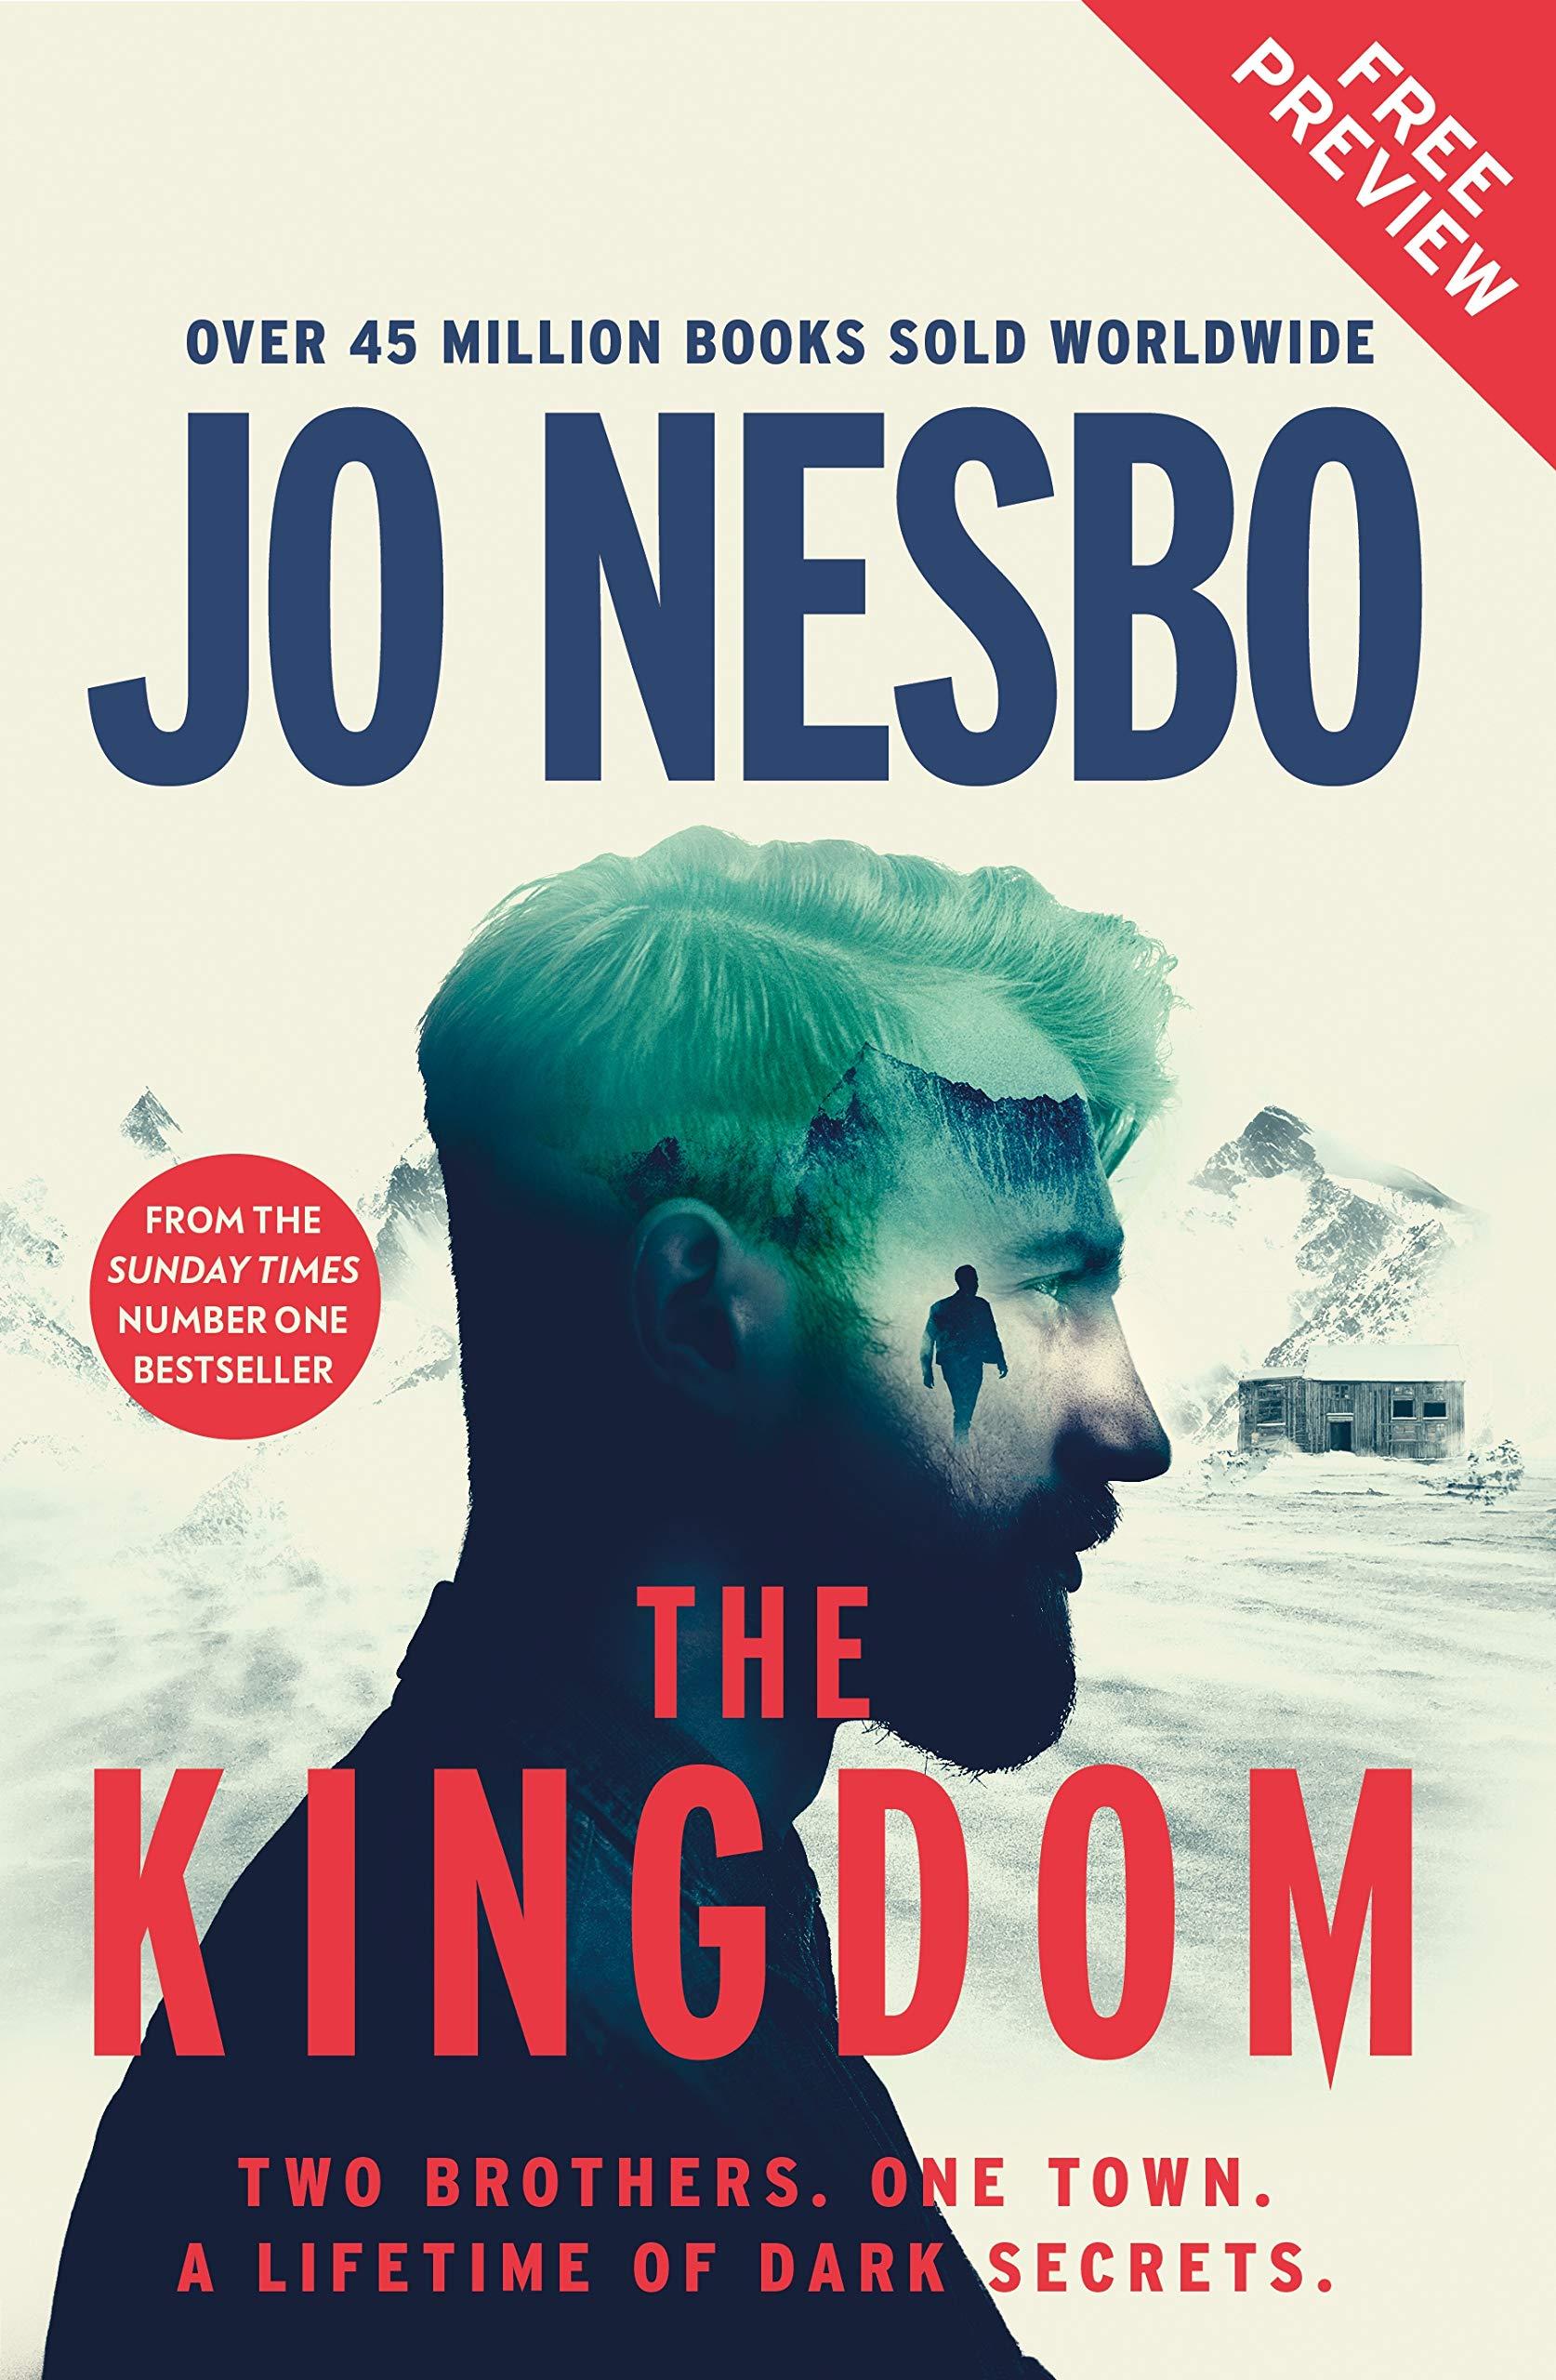 New Jo Nesbo Thriller: The Kingdom Free Ebook Sampler